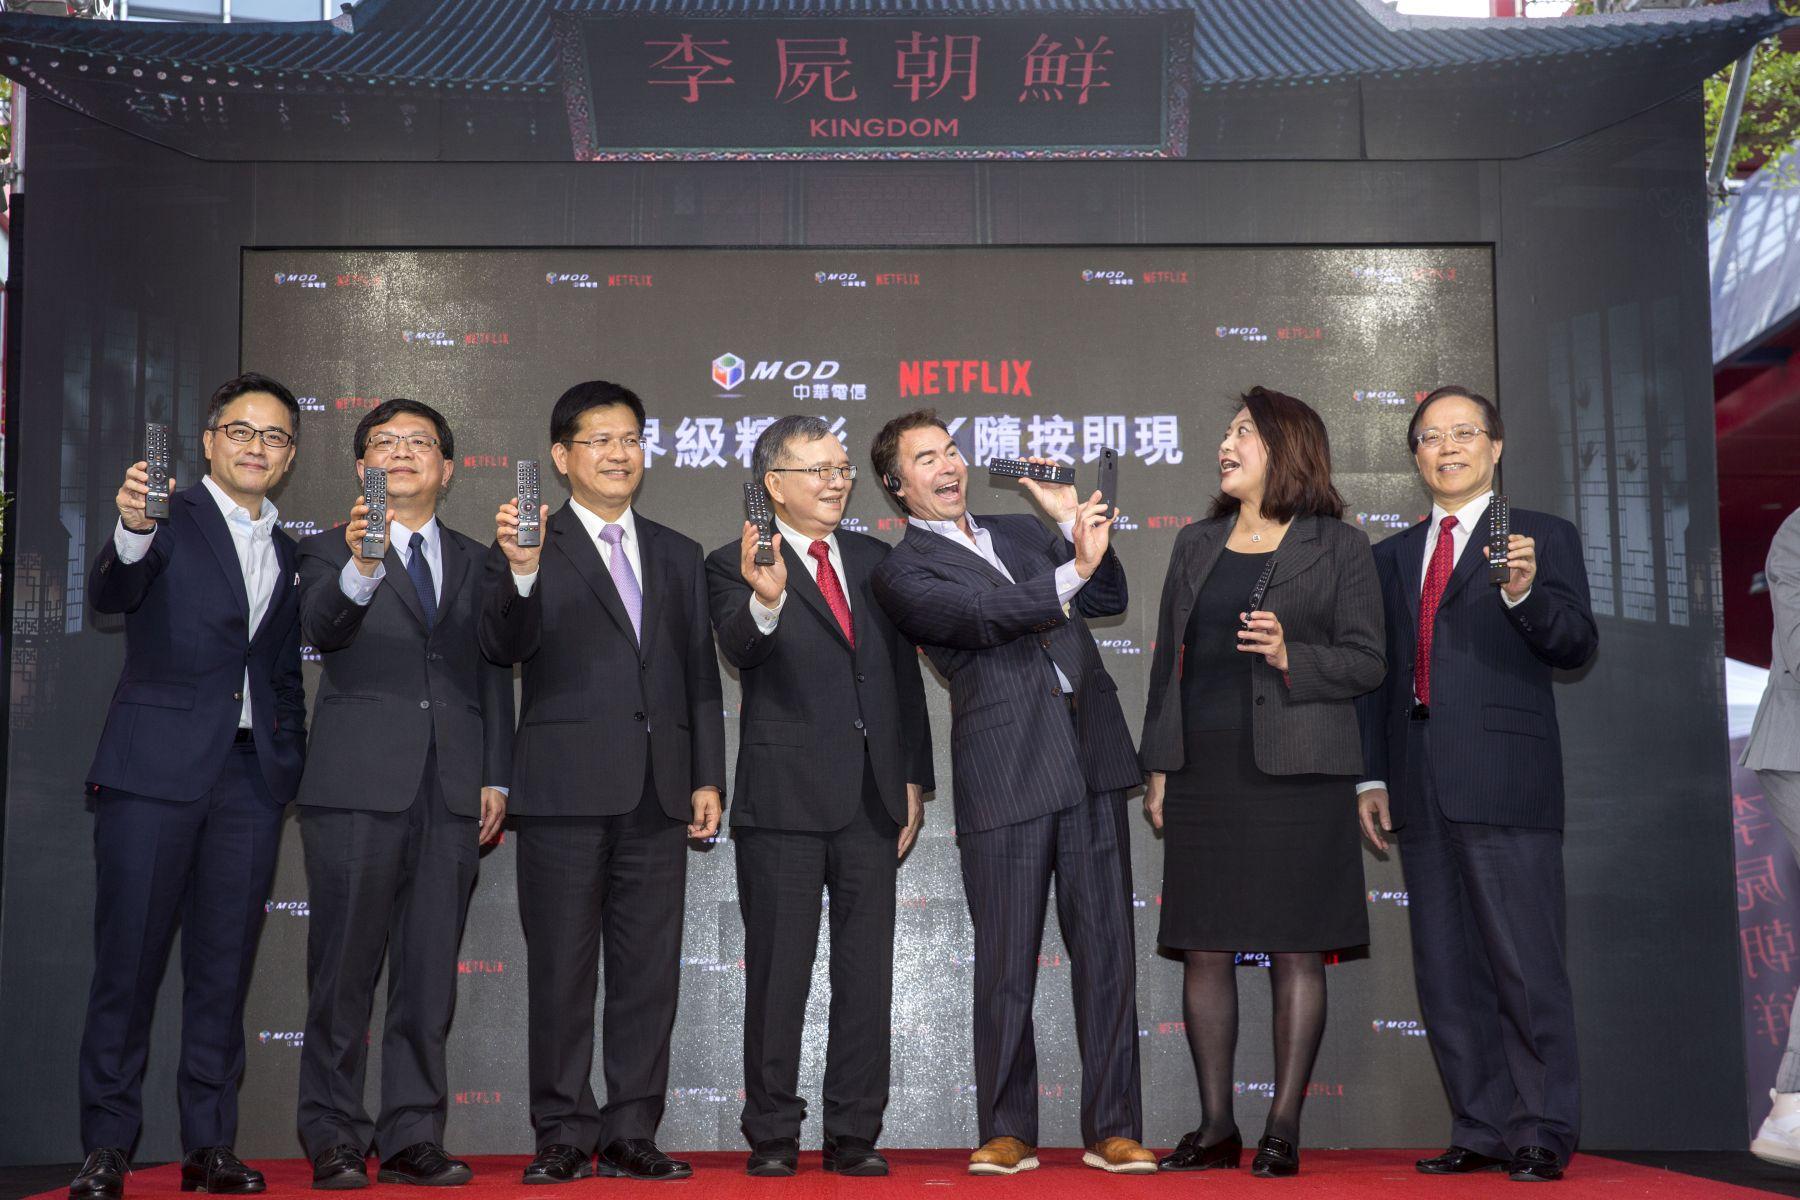 Netflix攻上中華電信MOD 雙強合作各有什麼盤算?